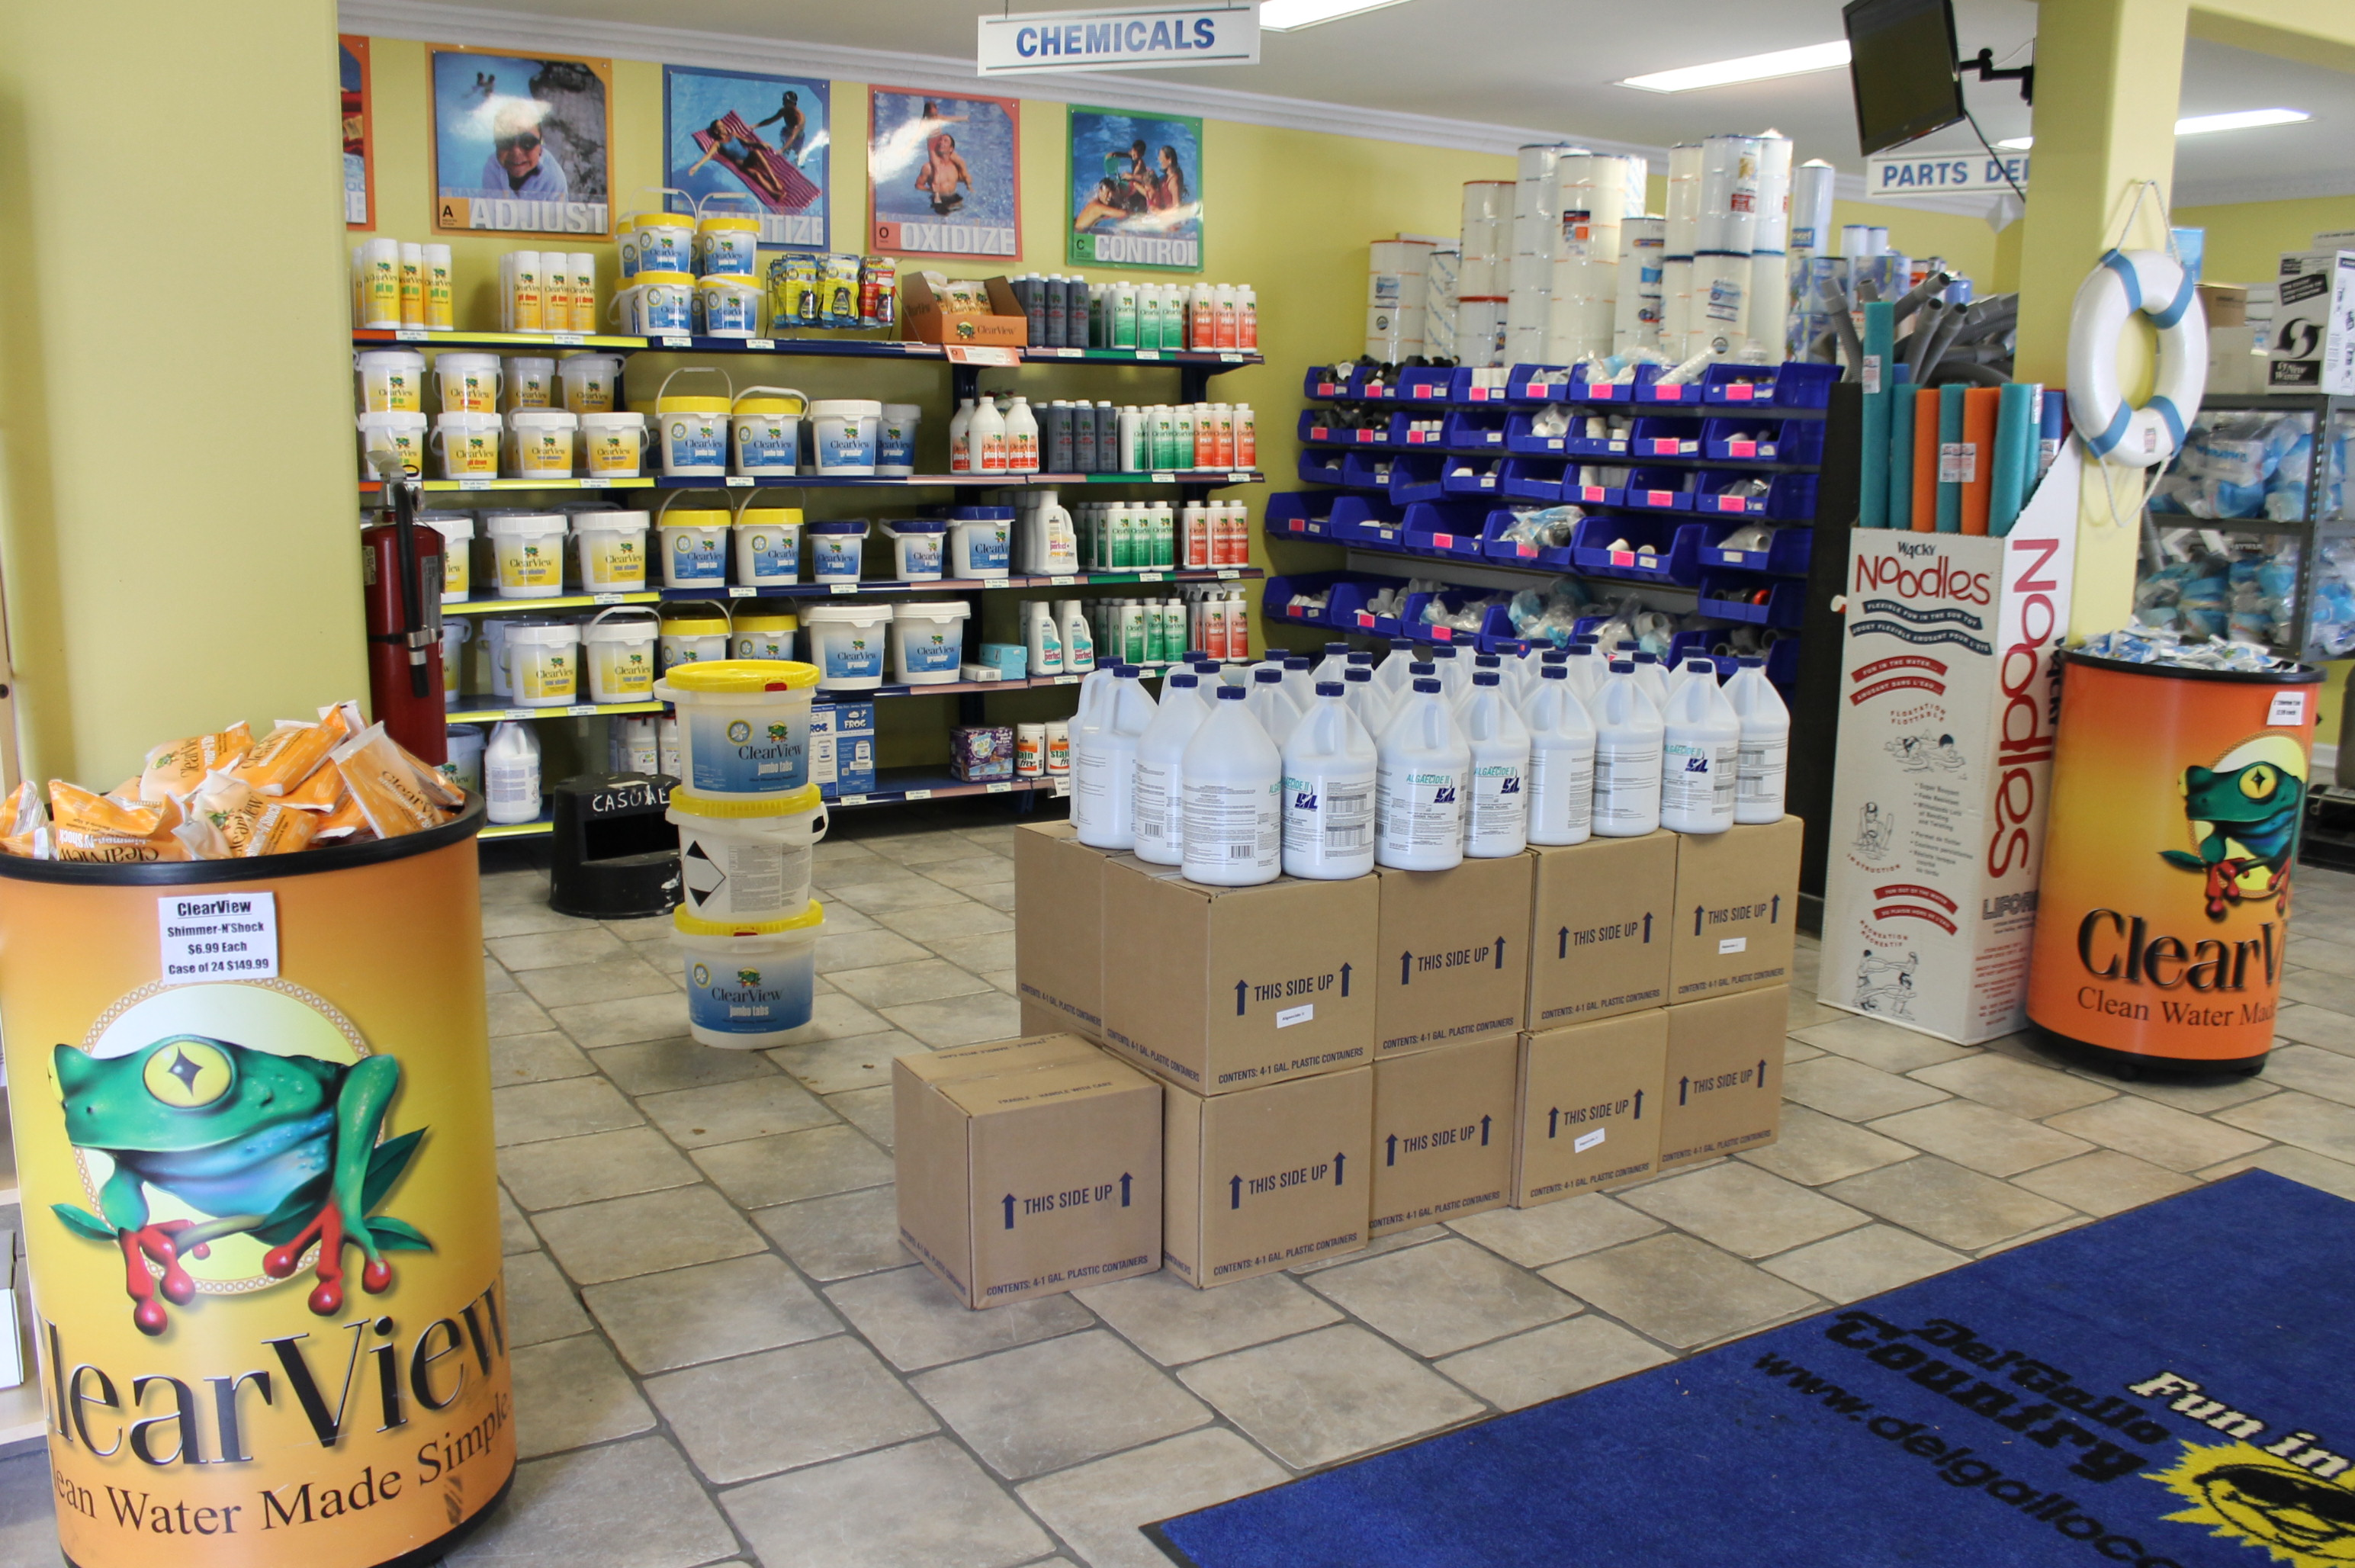 Pool Supplies - Chemicals, Chlorine